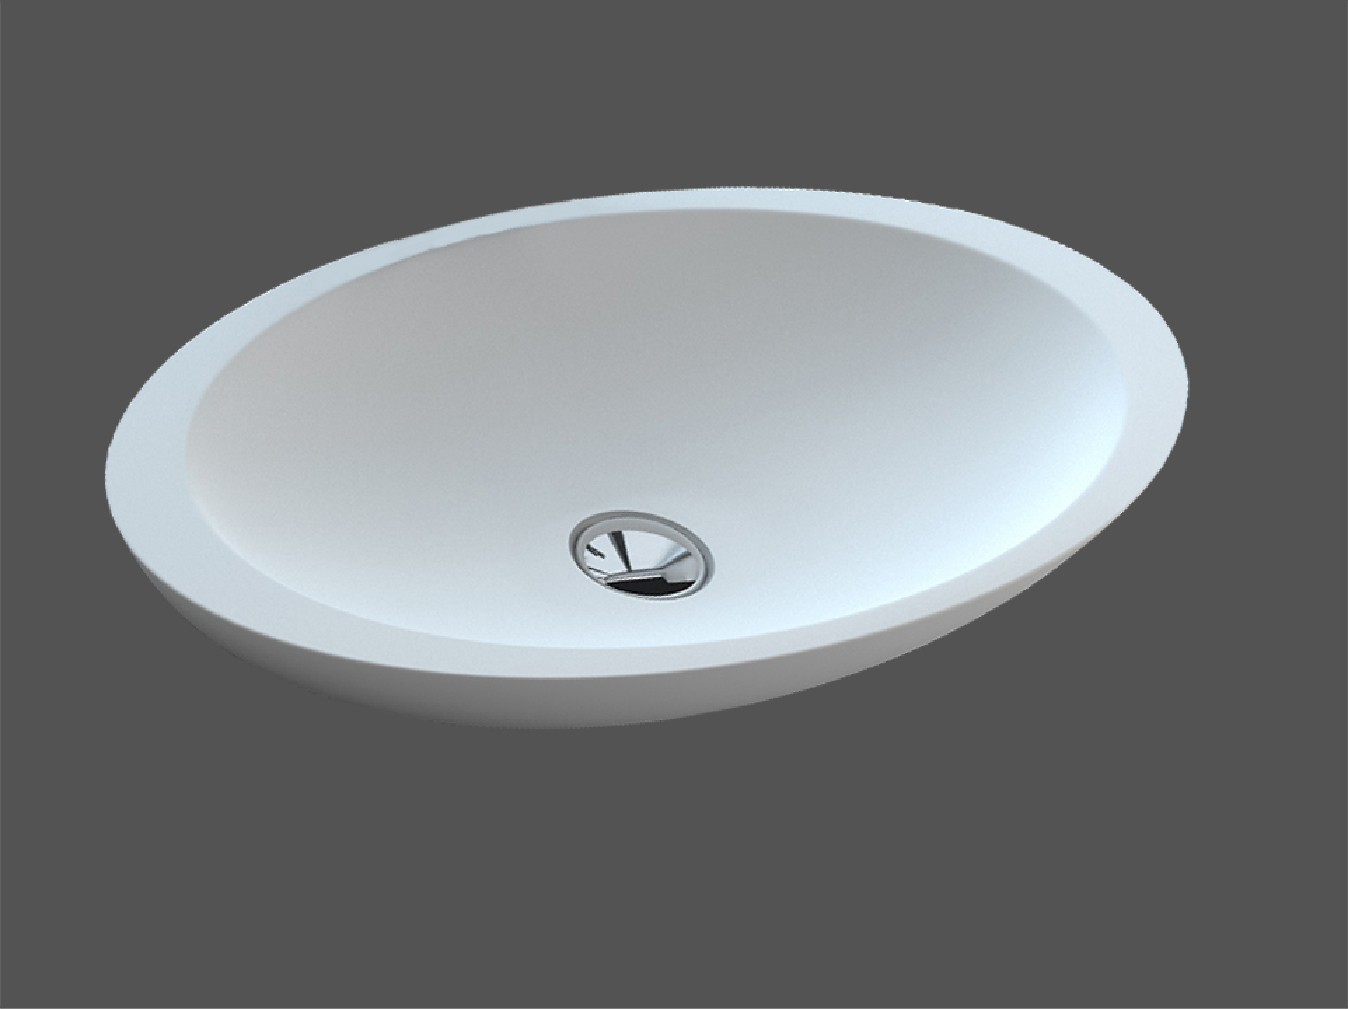 LR9005 Image